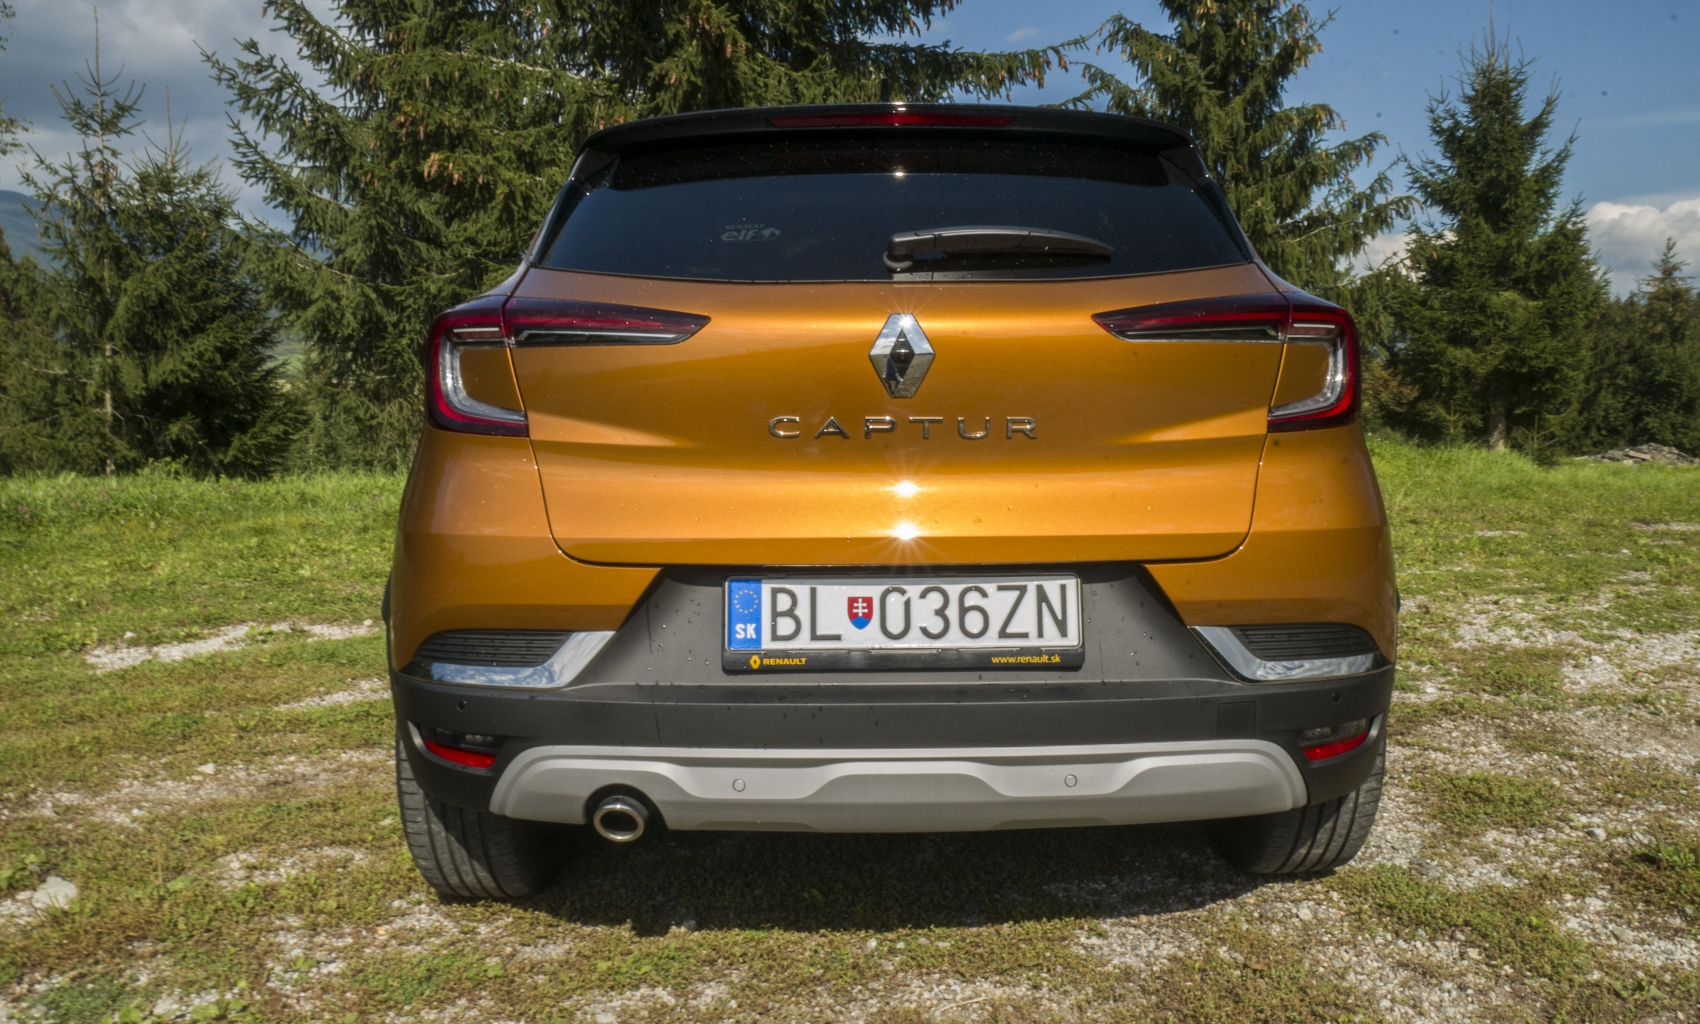 Test: V interiéri sa Renault Captur tvári ako o triedu drahšie auto EjcDoz3Y51 renault-captur-8